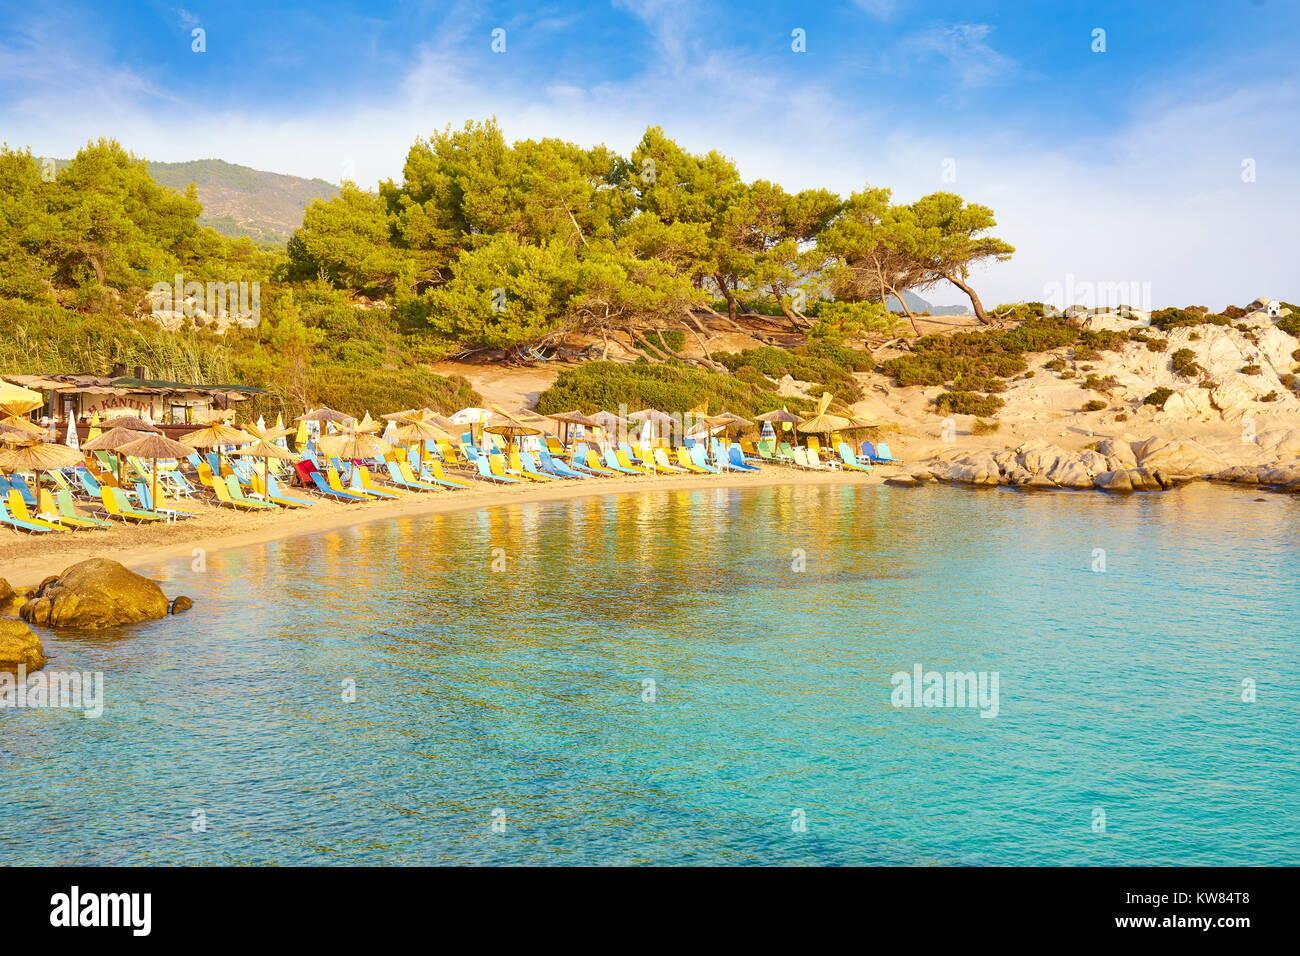 Orange Beach, Chalkidiki or Halkidiki, Greece - Stock Image